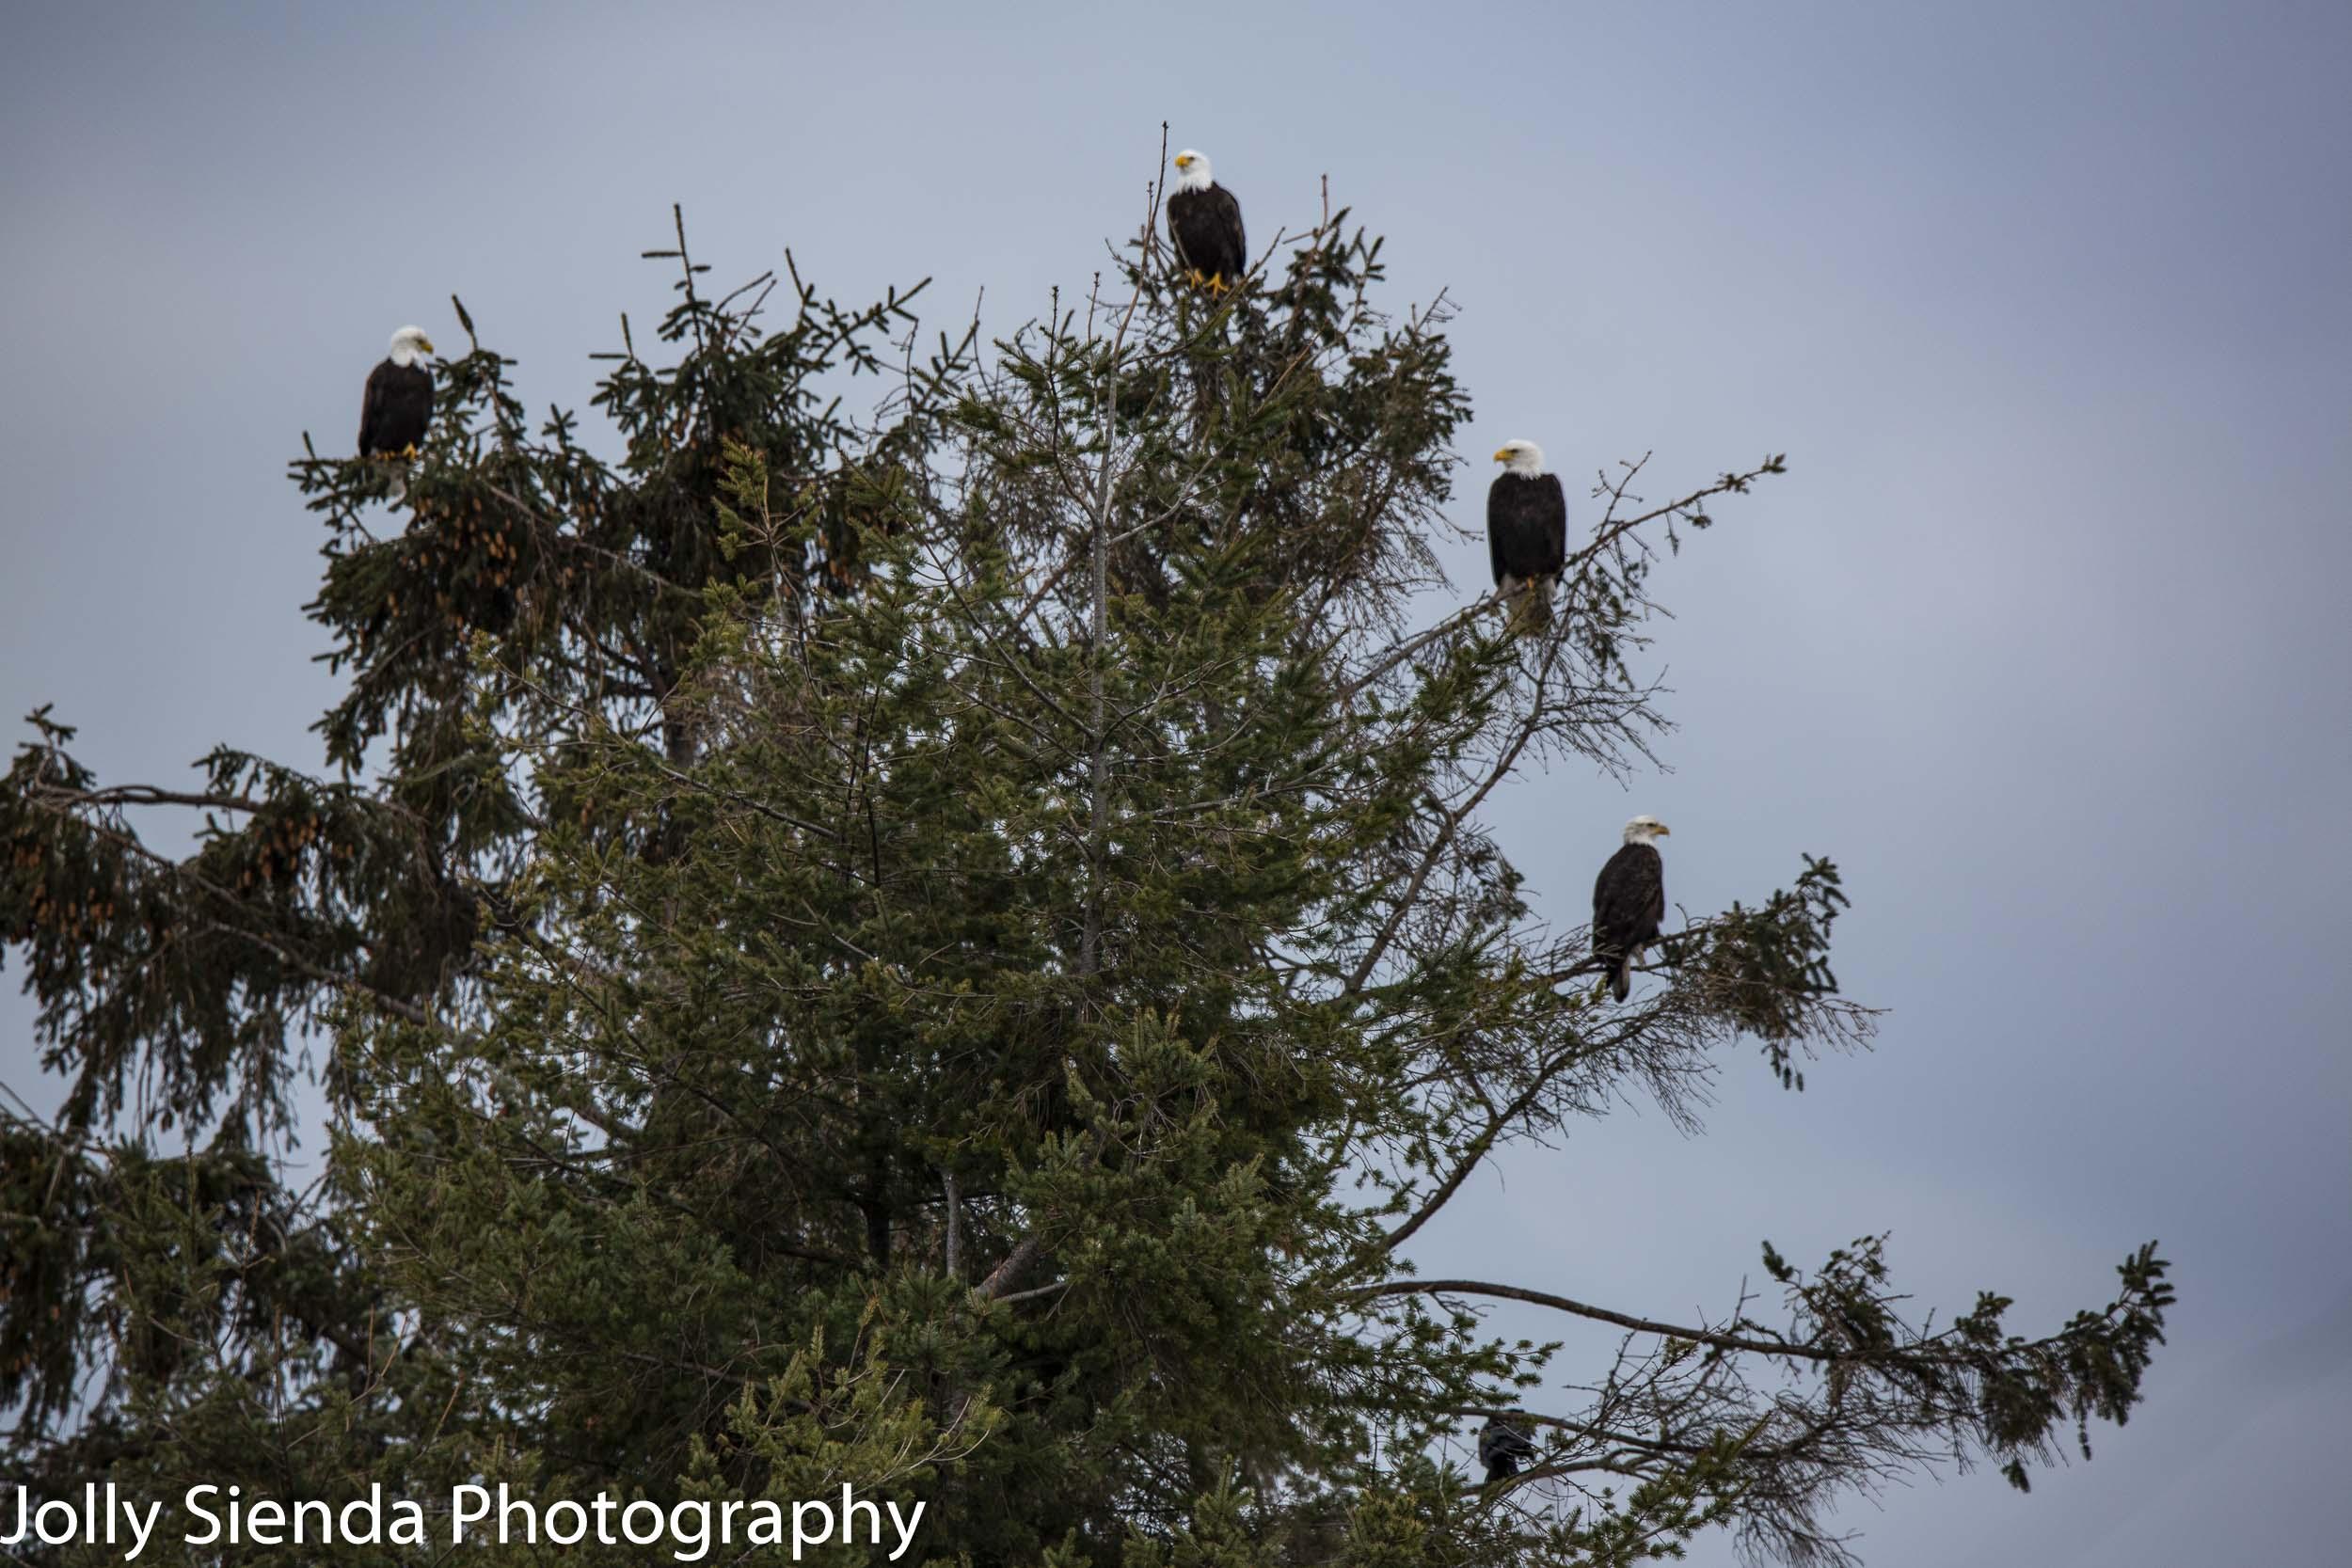 Bald Eagles up in a tree, Skagit Valley, Washington